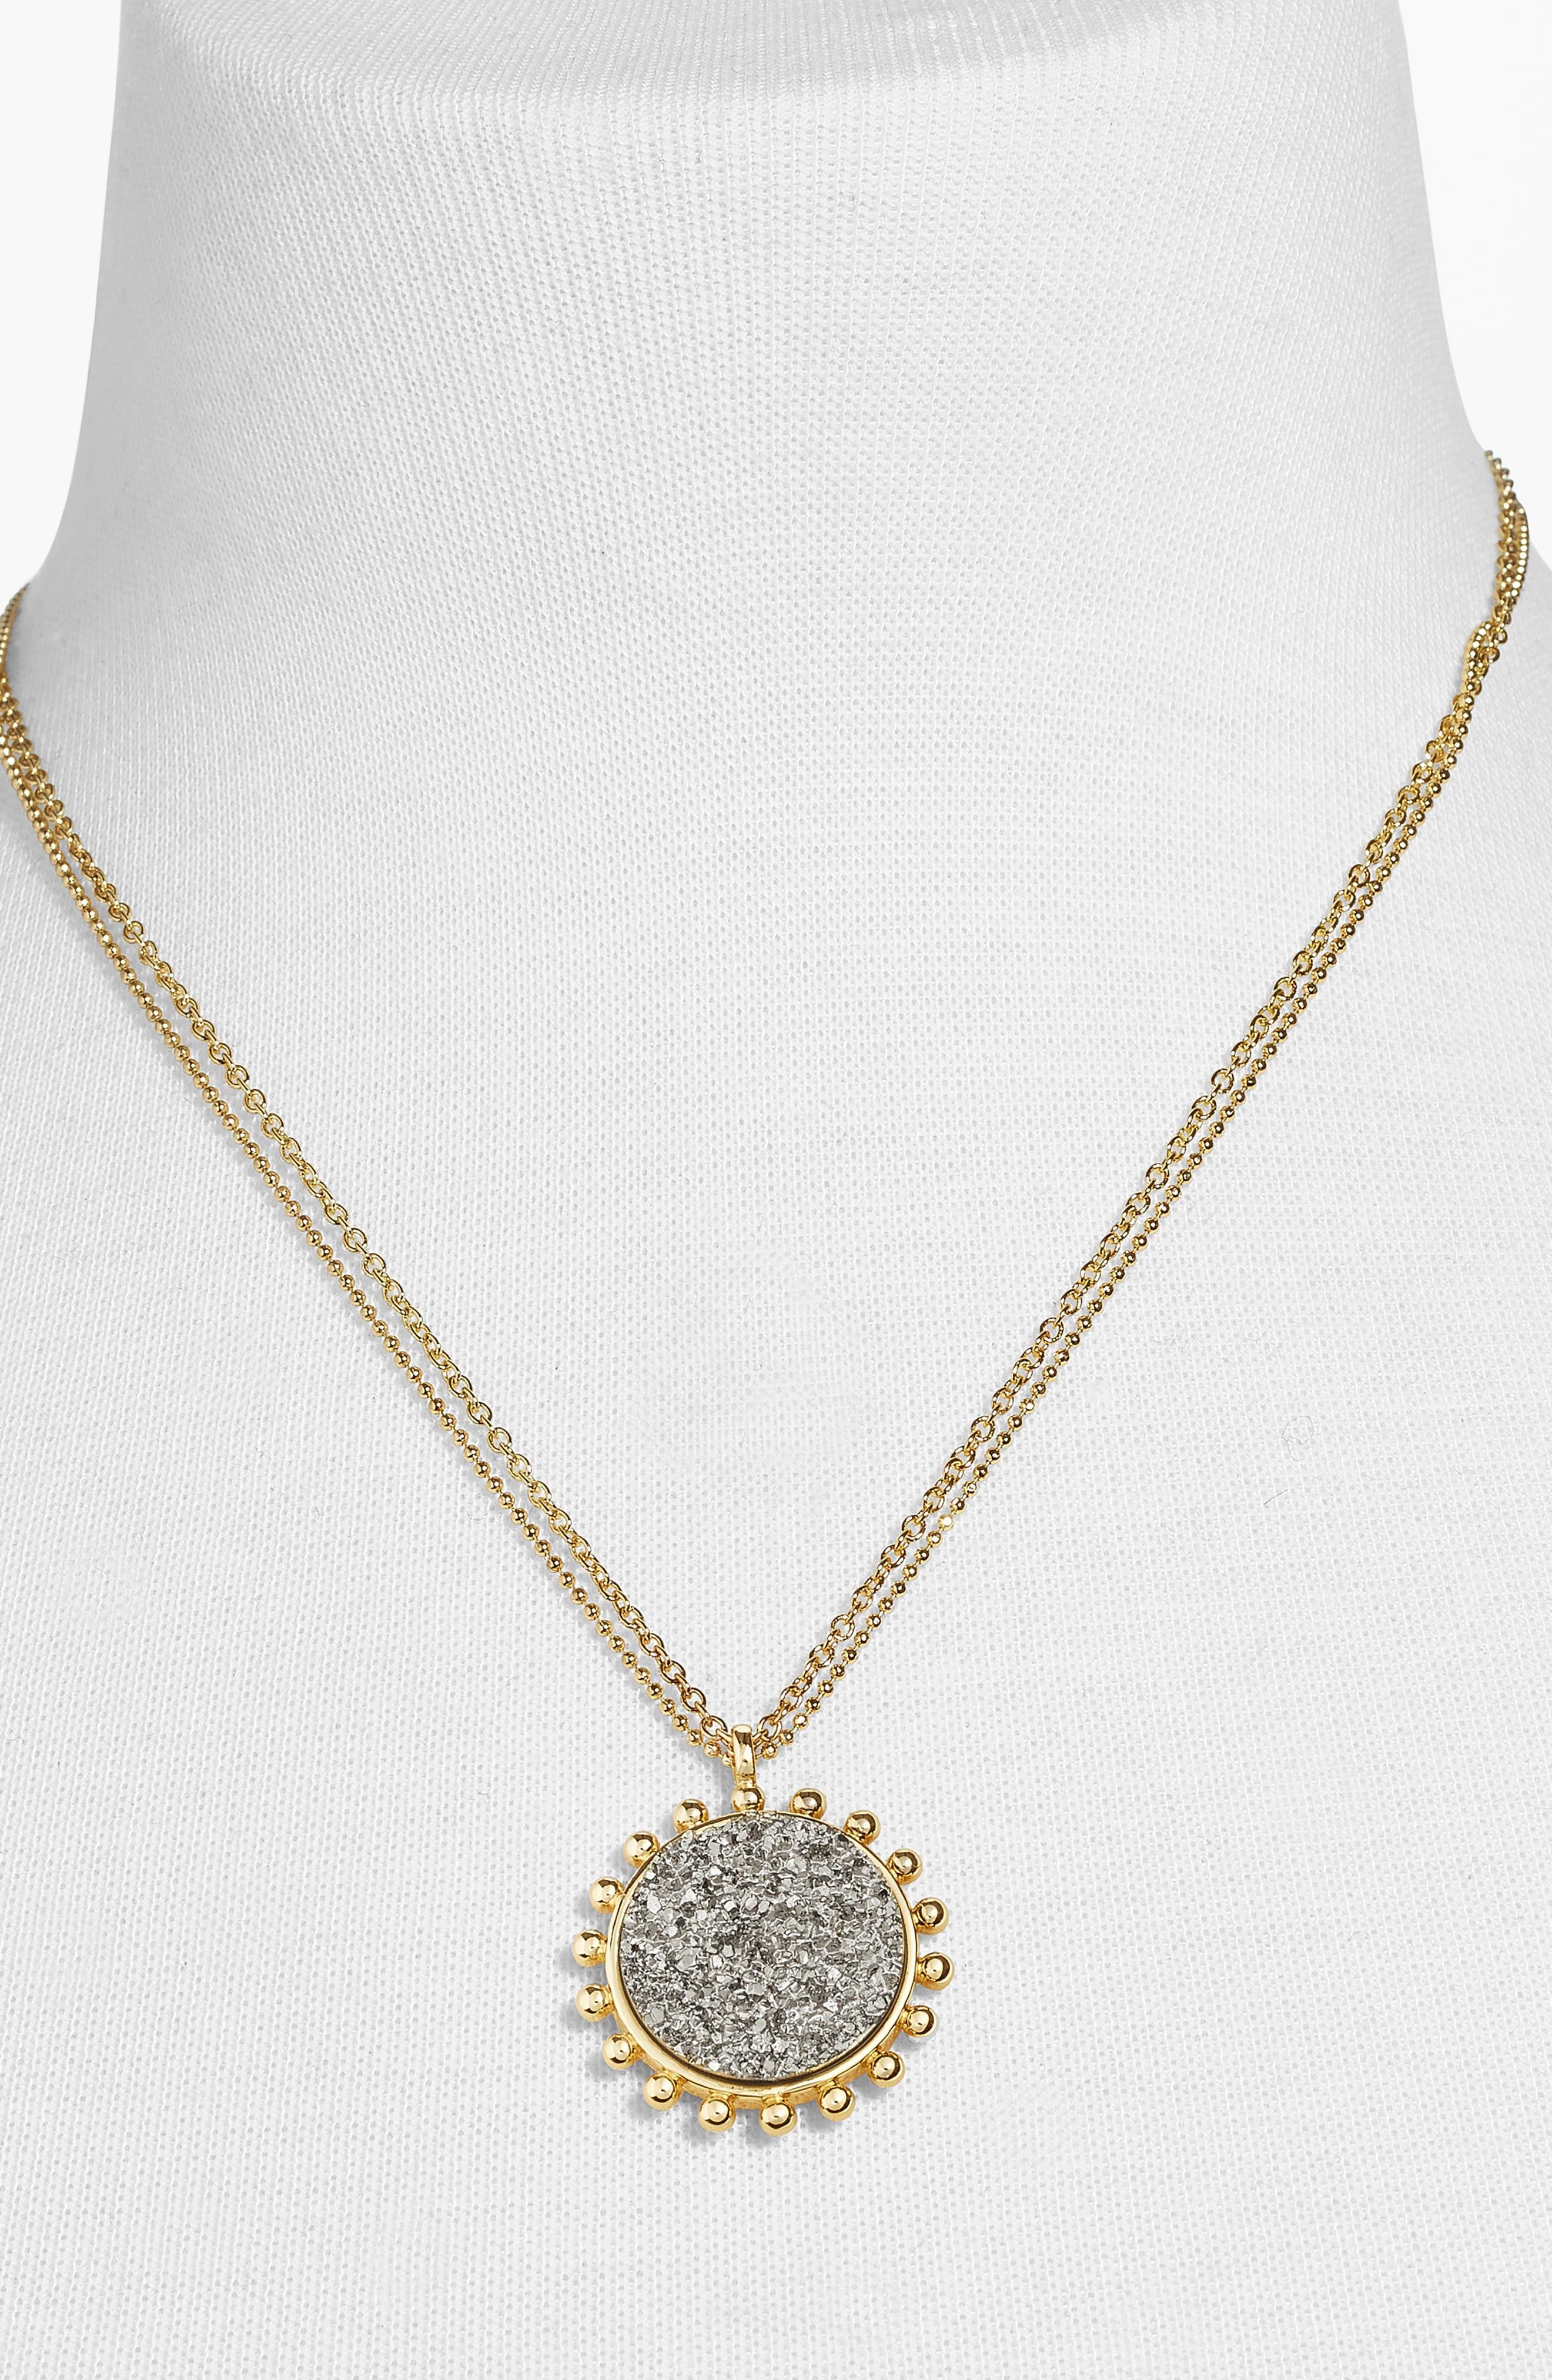 Kerison Drusy Pendant Necklace,                             Alternate thumbnail 2, color,                             METALLIC GREY